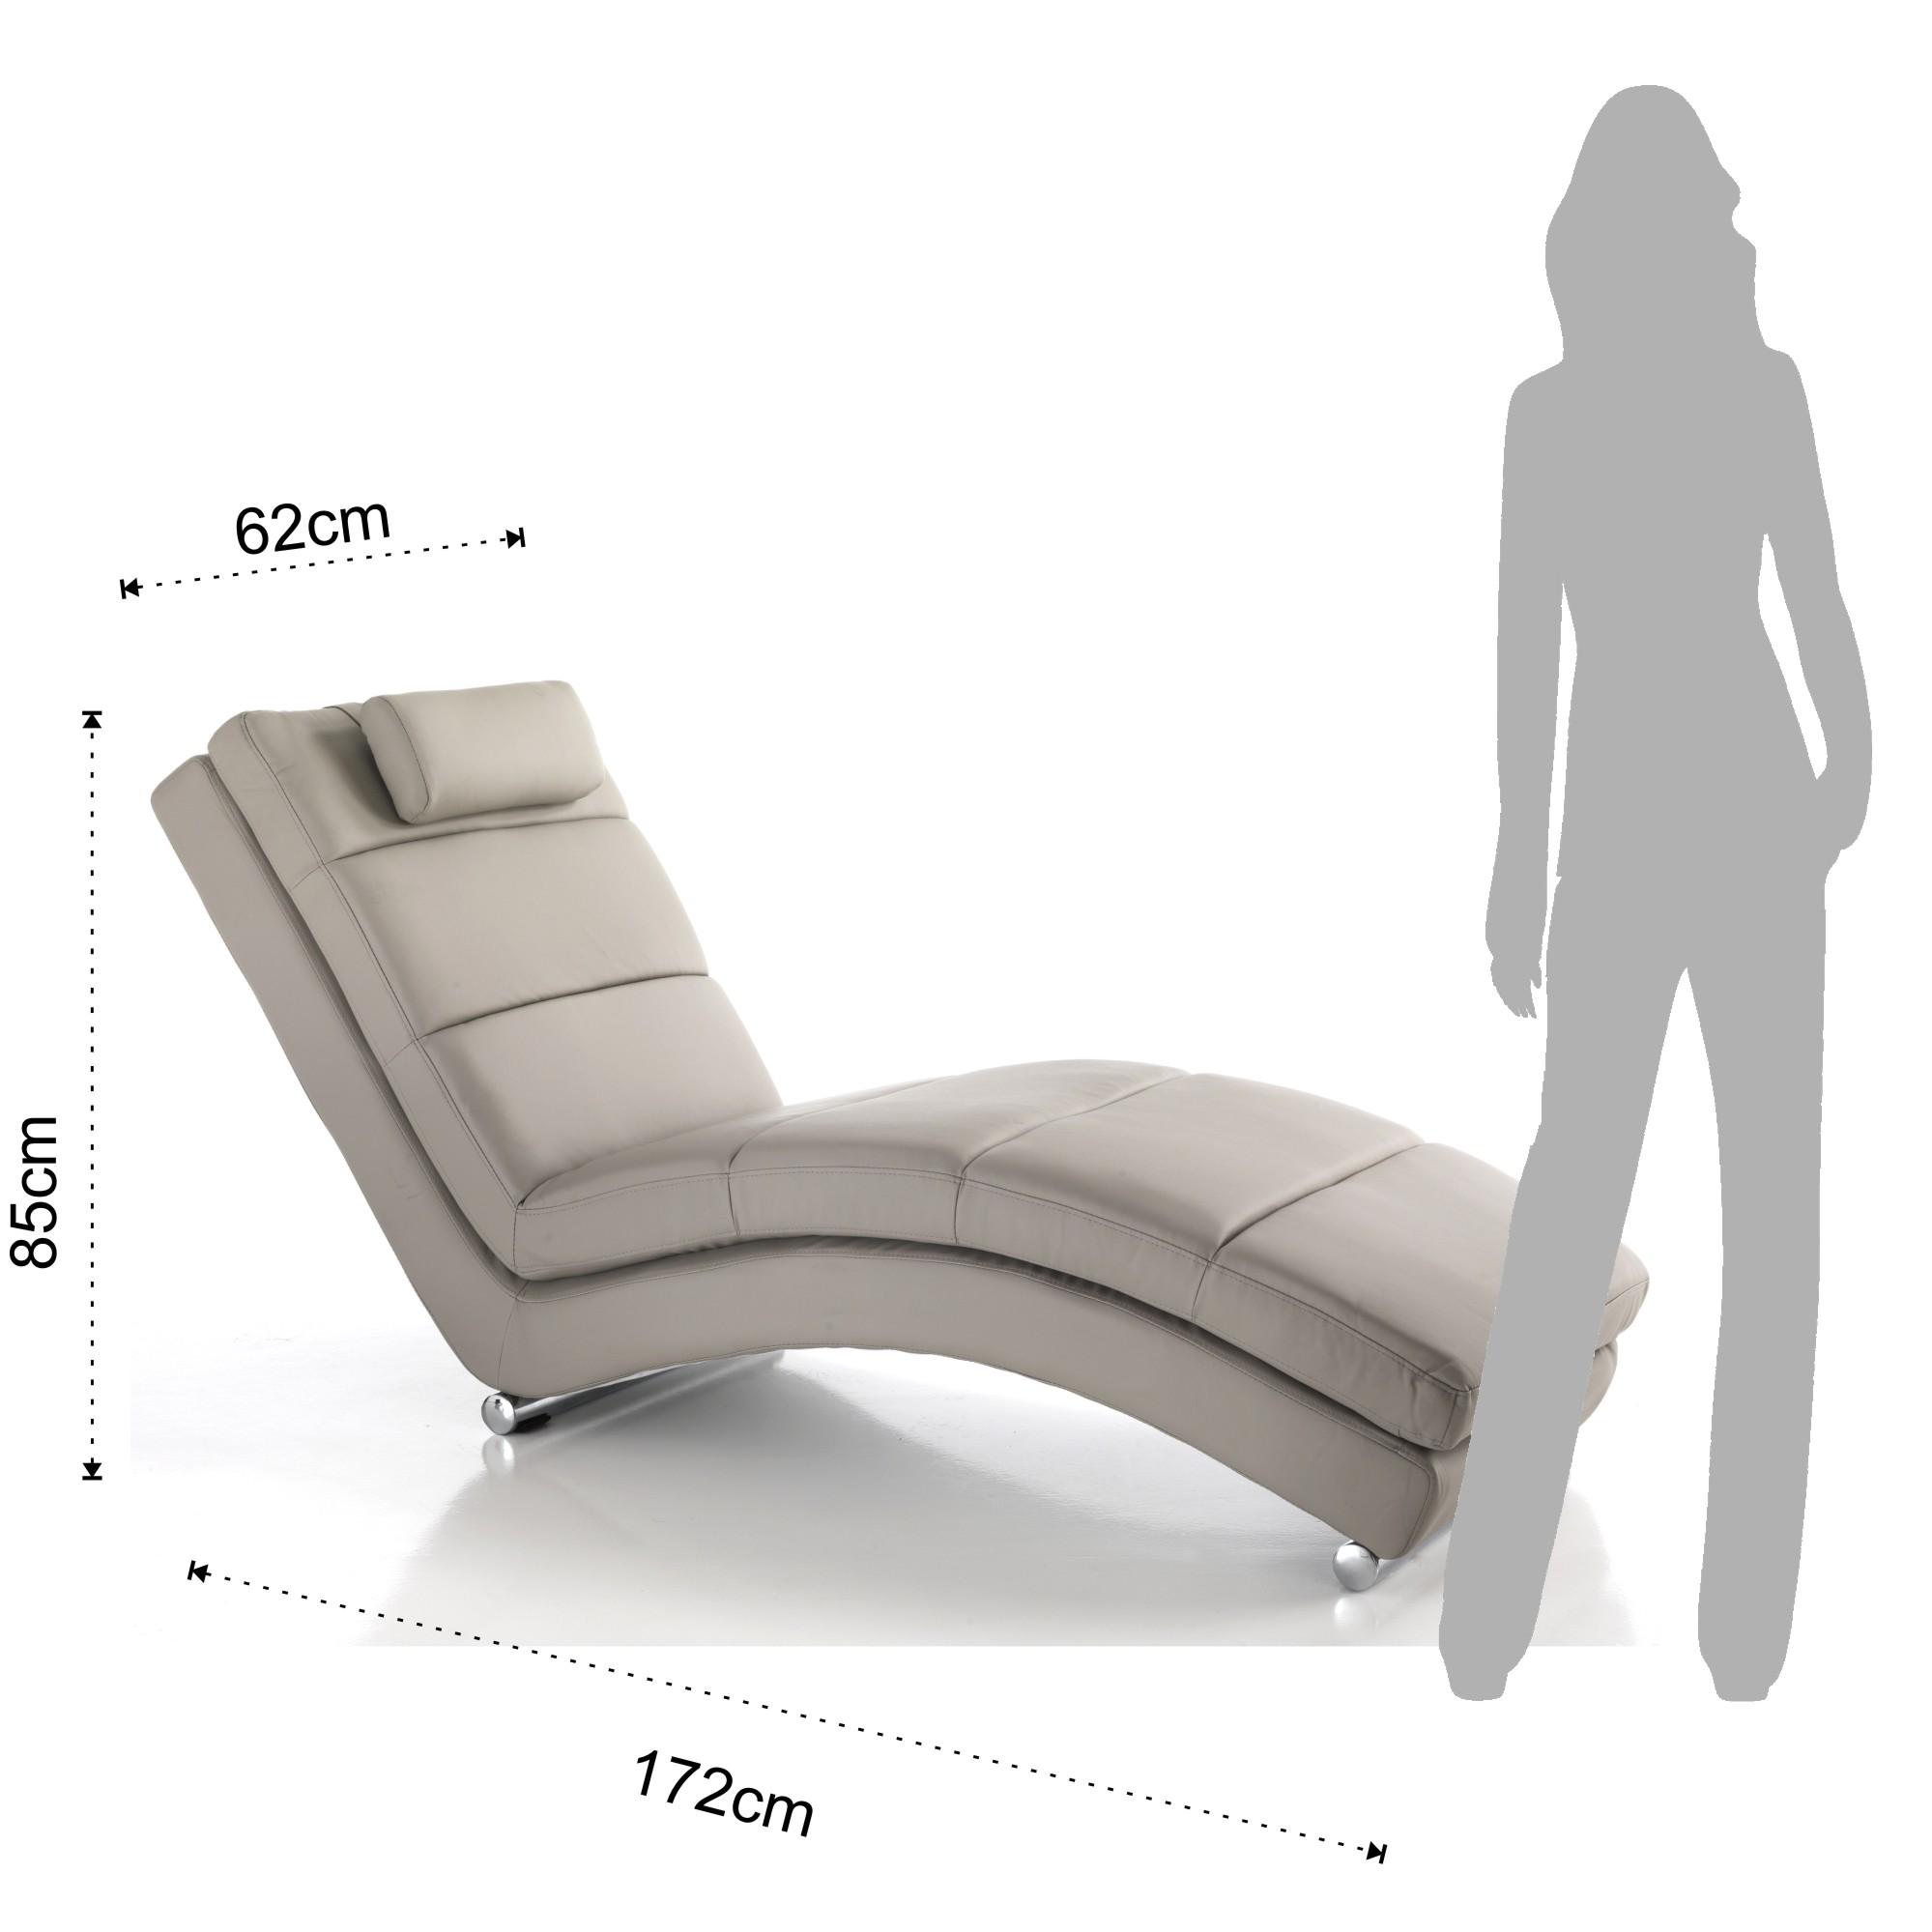 blazers chaise longue sofia taupe. Black Bedroom Furniture Sets. Home Design Ideas